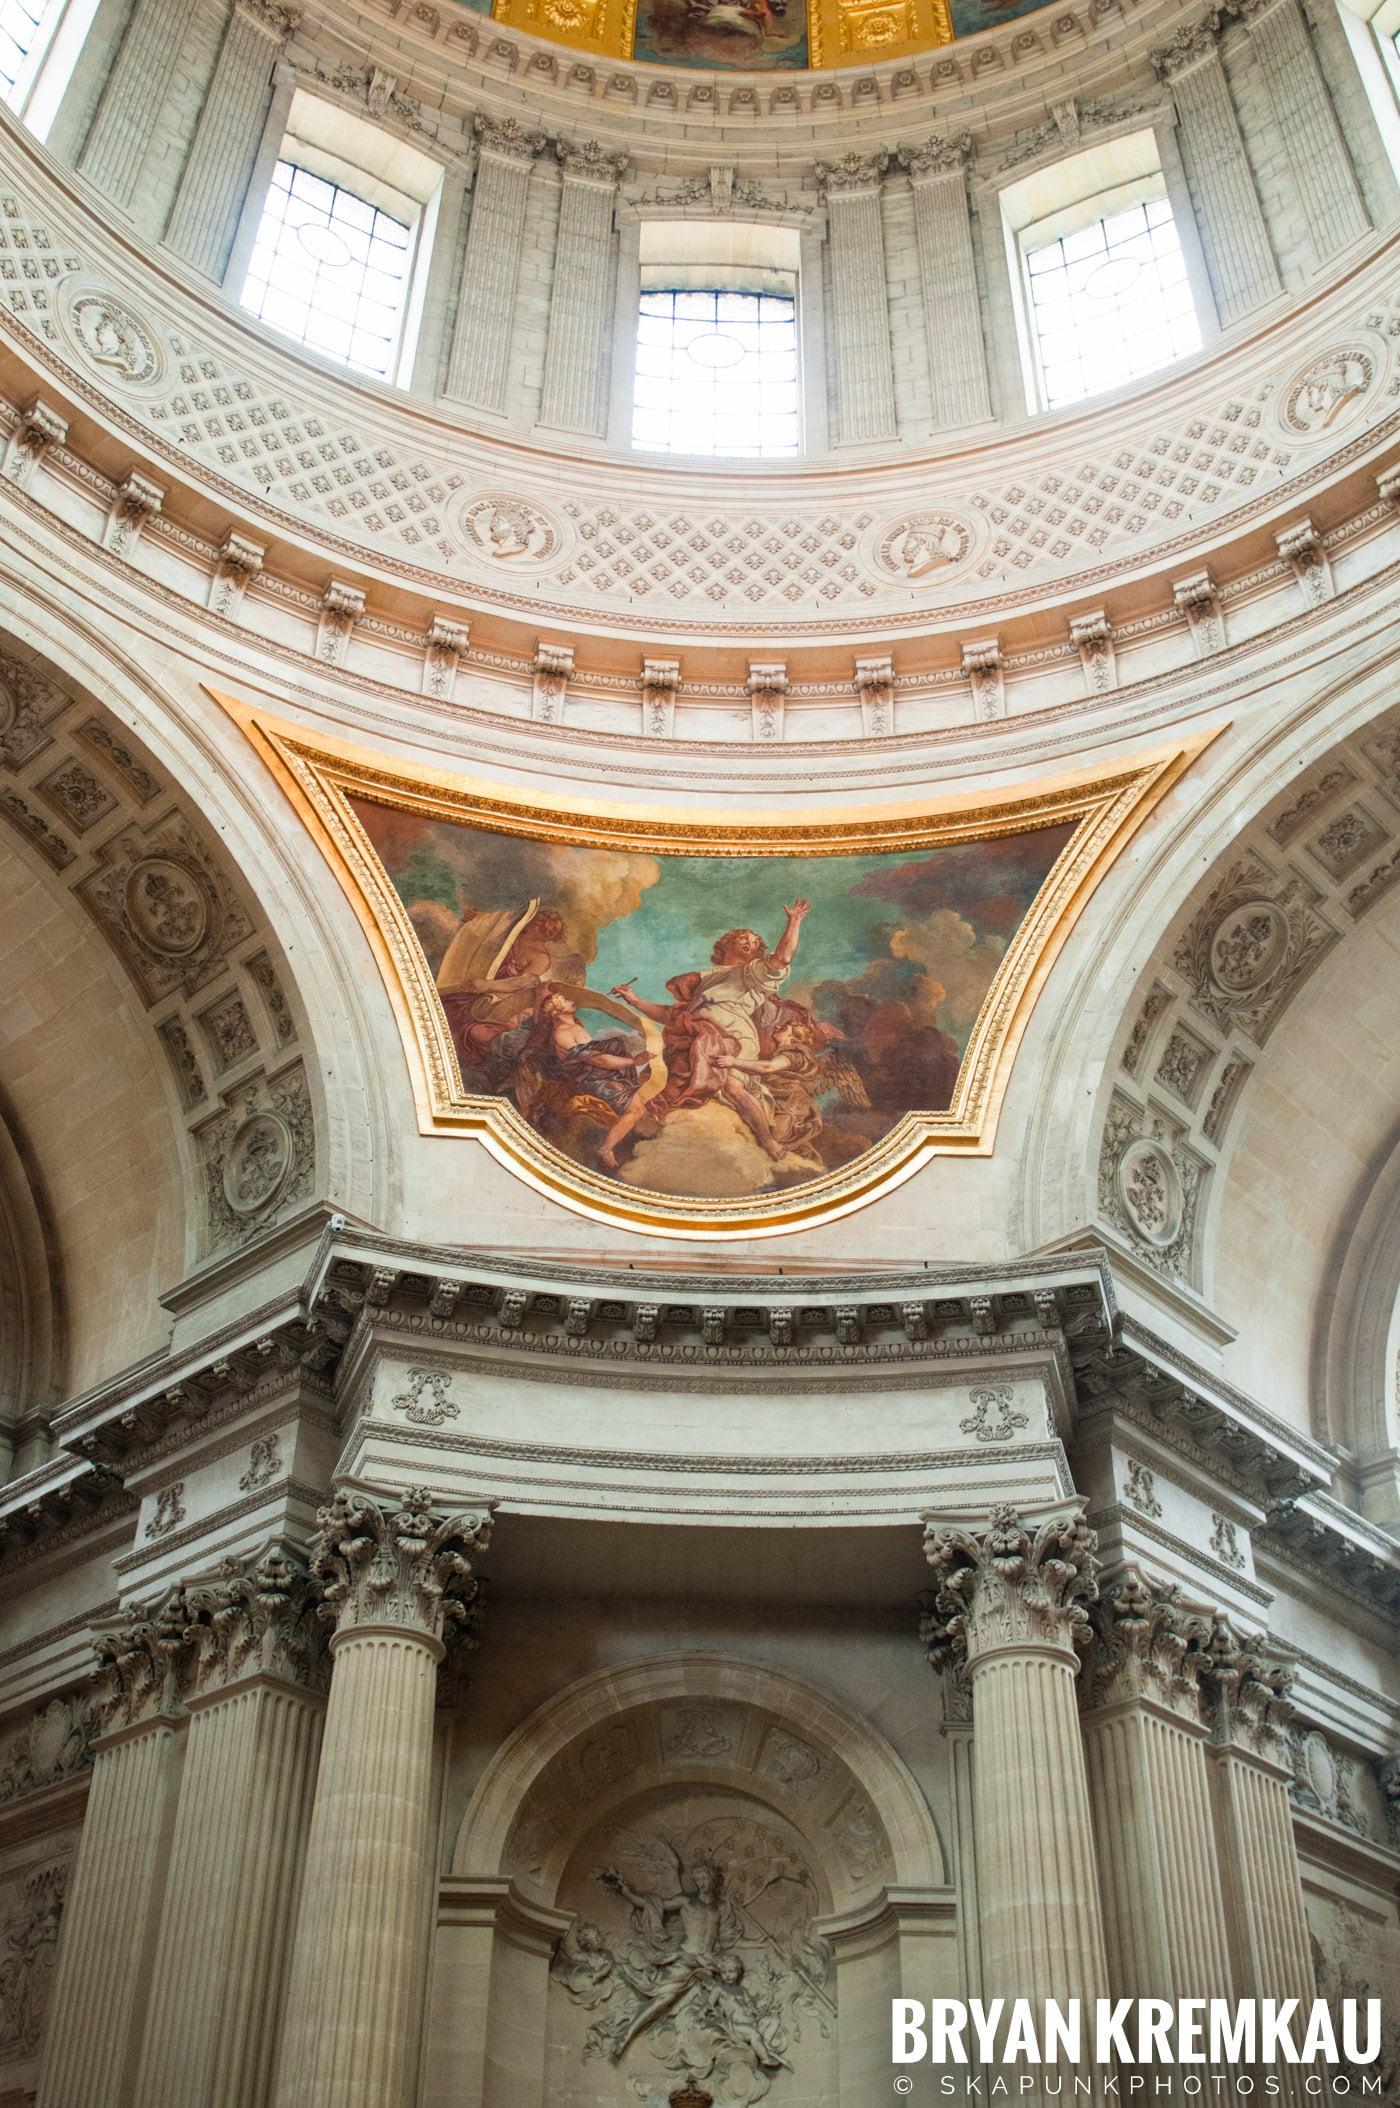 Paris, France Honeymoon - Day 3 - 7.20.11 (26)